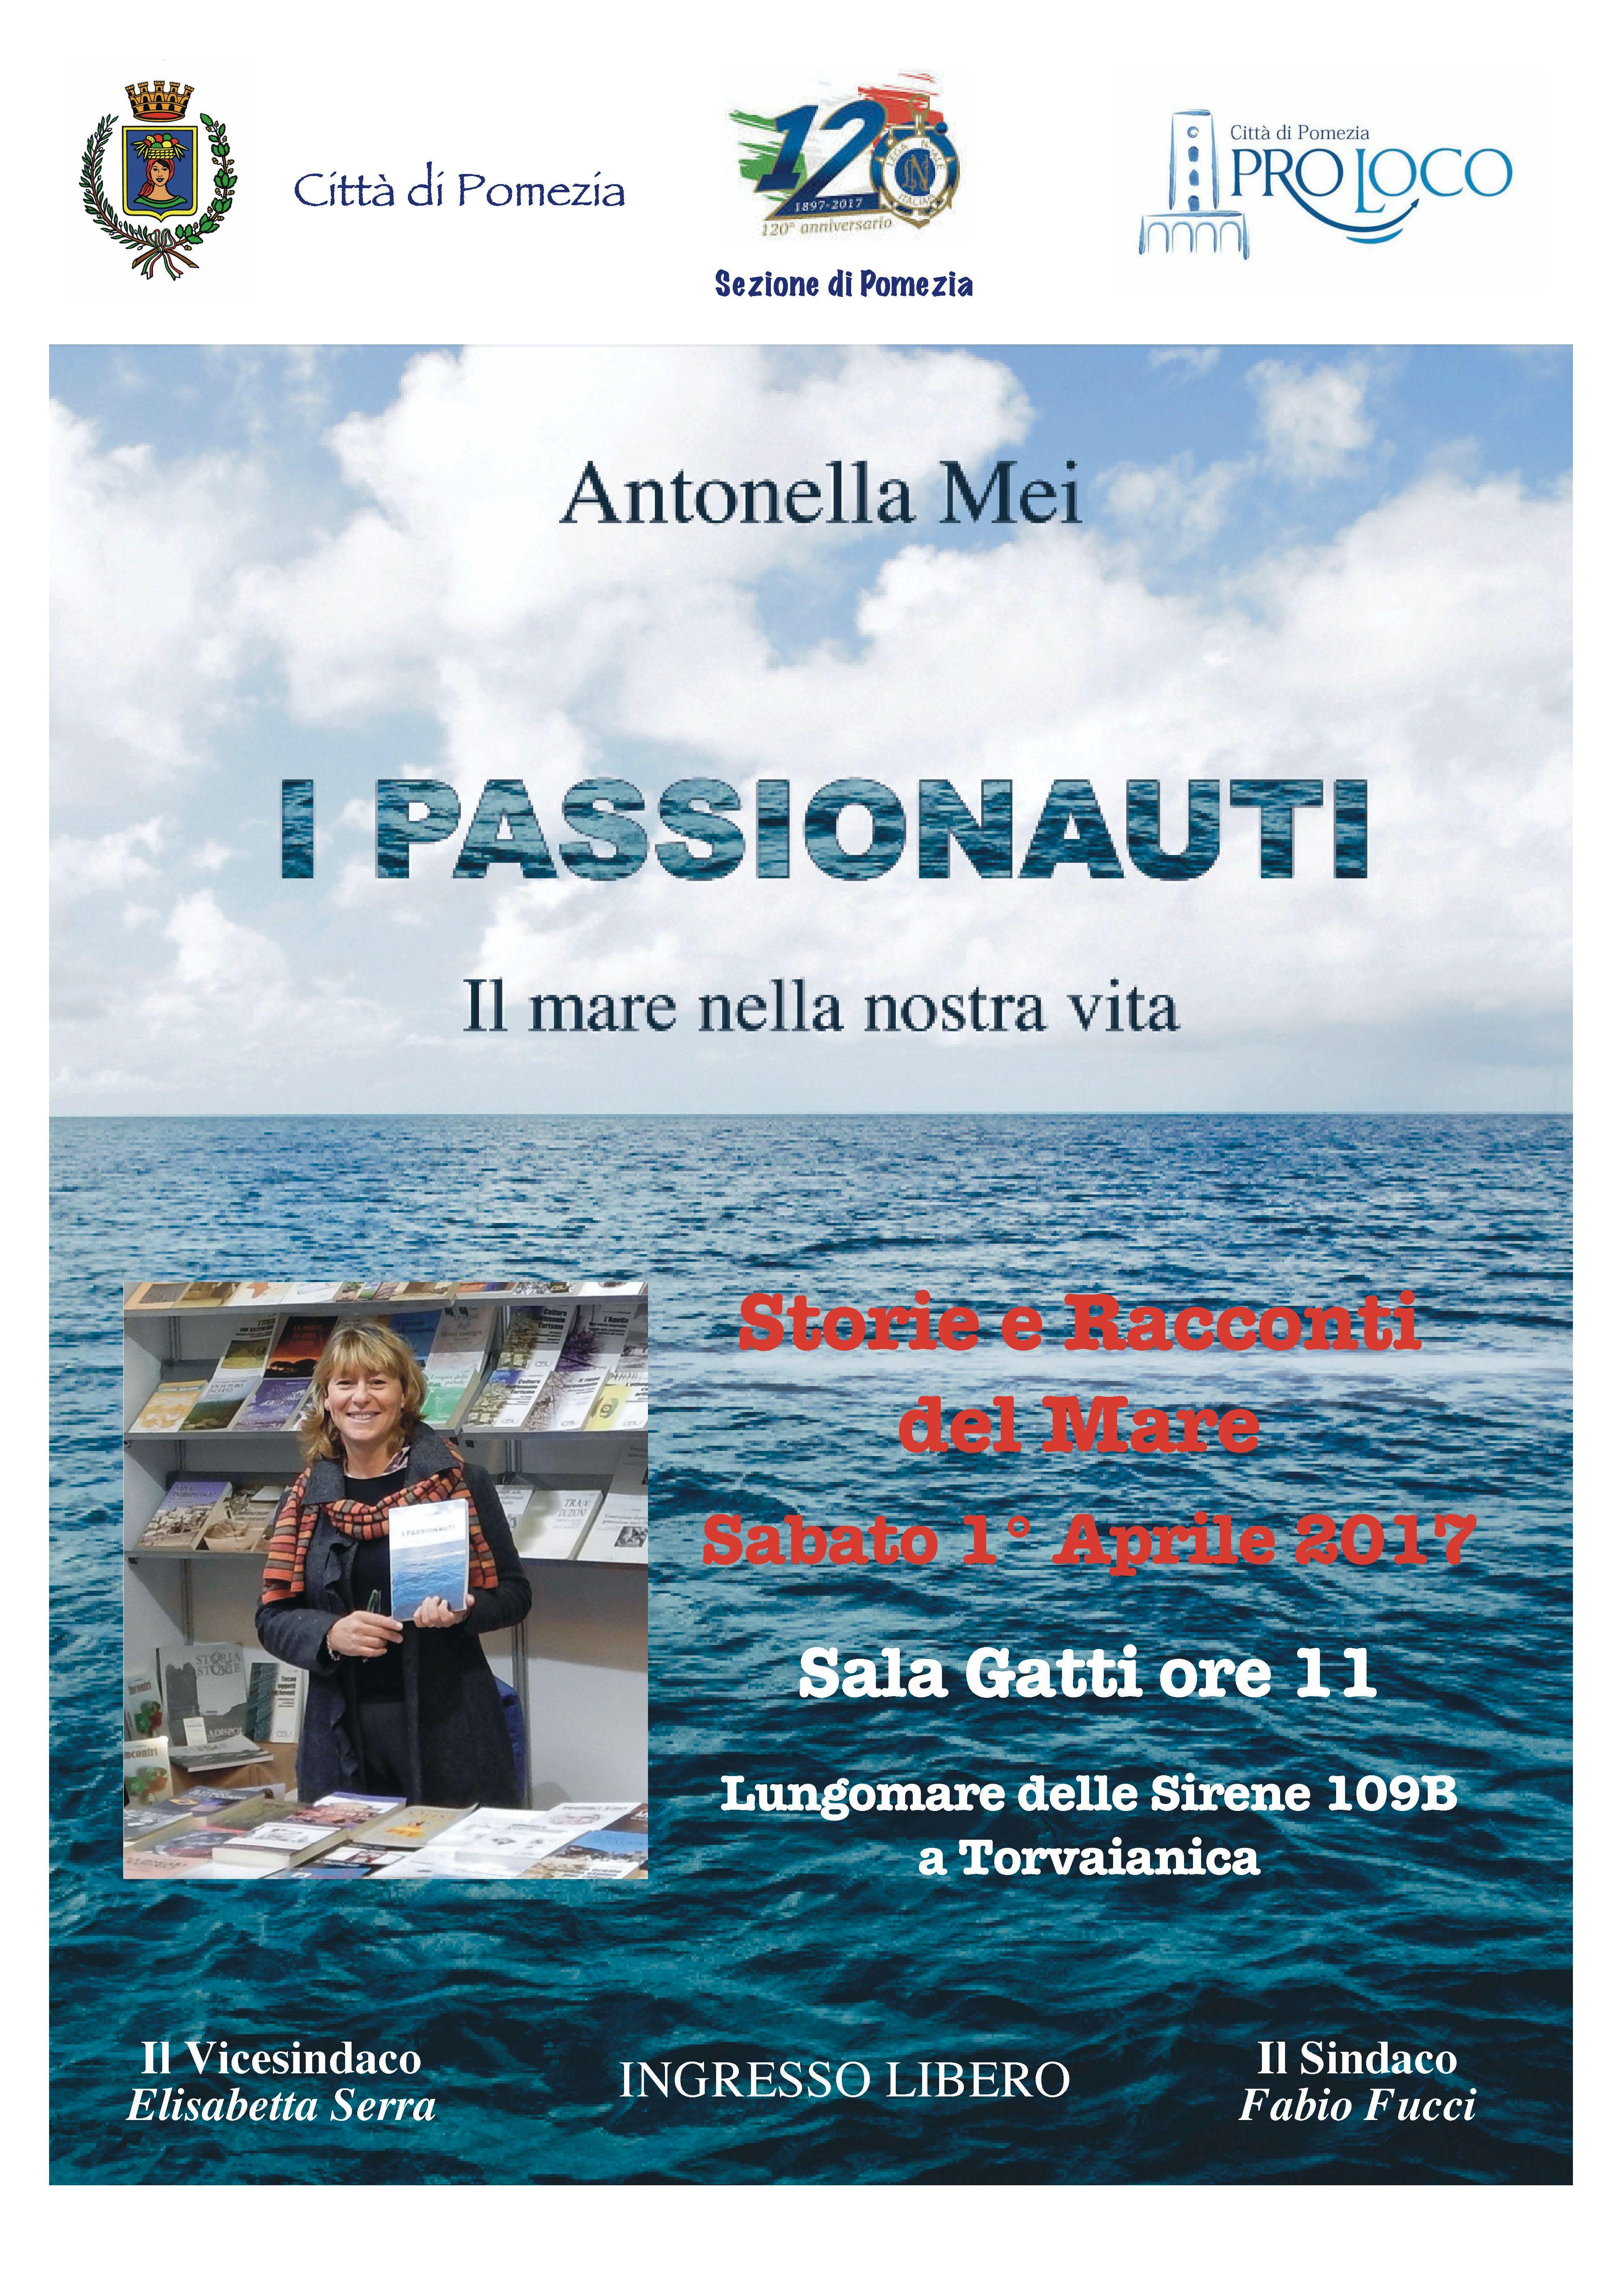 I Passionauti Antonella Mei